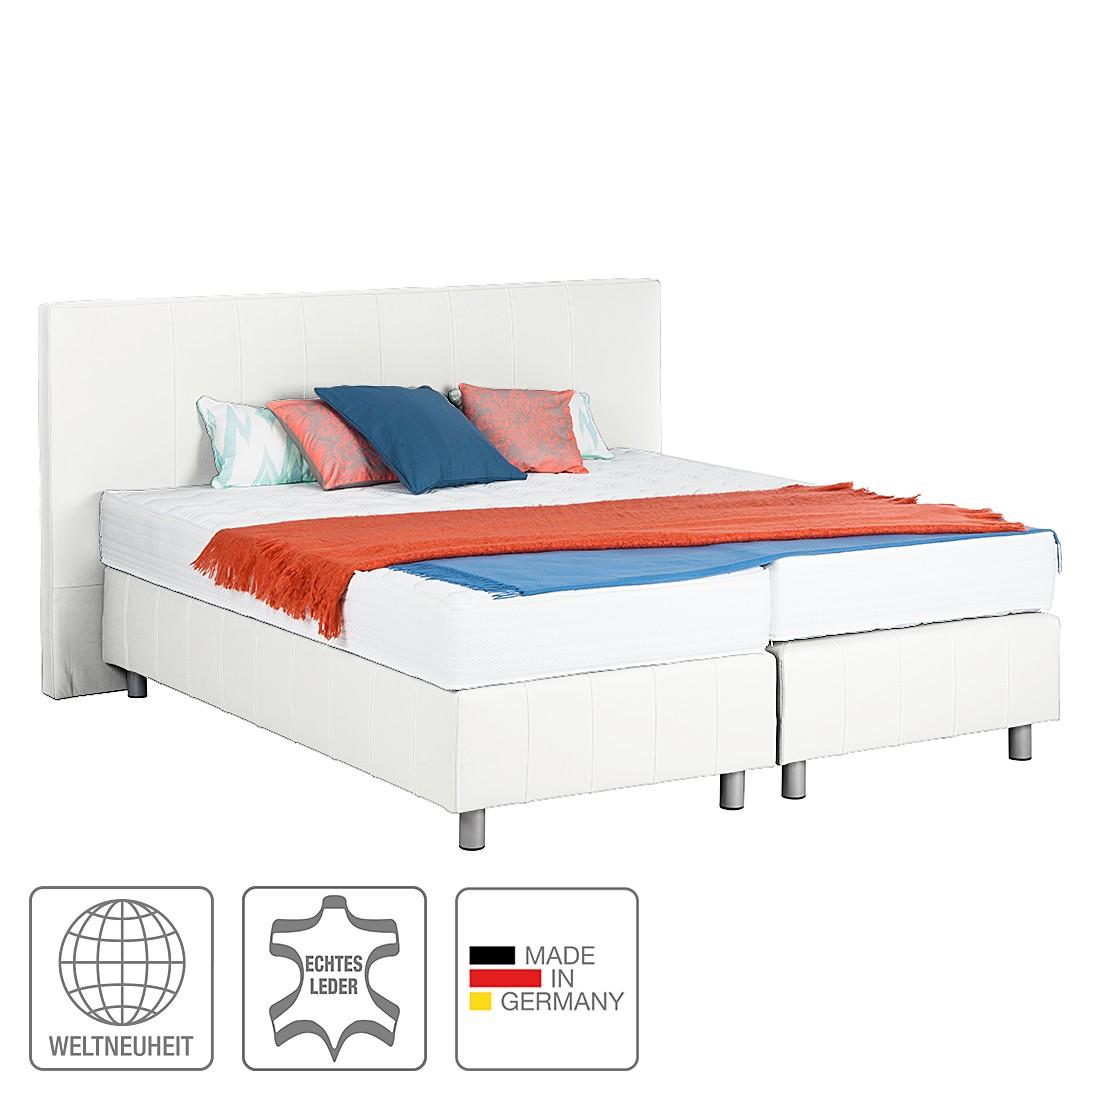 Boxspringbett Atlanta (Echtleder) - Ohne Topper - 160 x 200cm - H3 ab 80 kg - Weiß, Art of Sleep